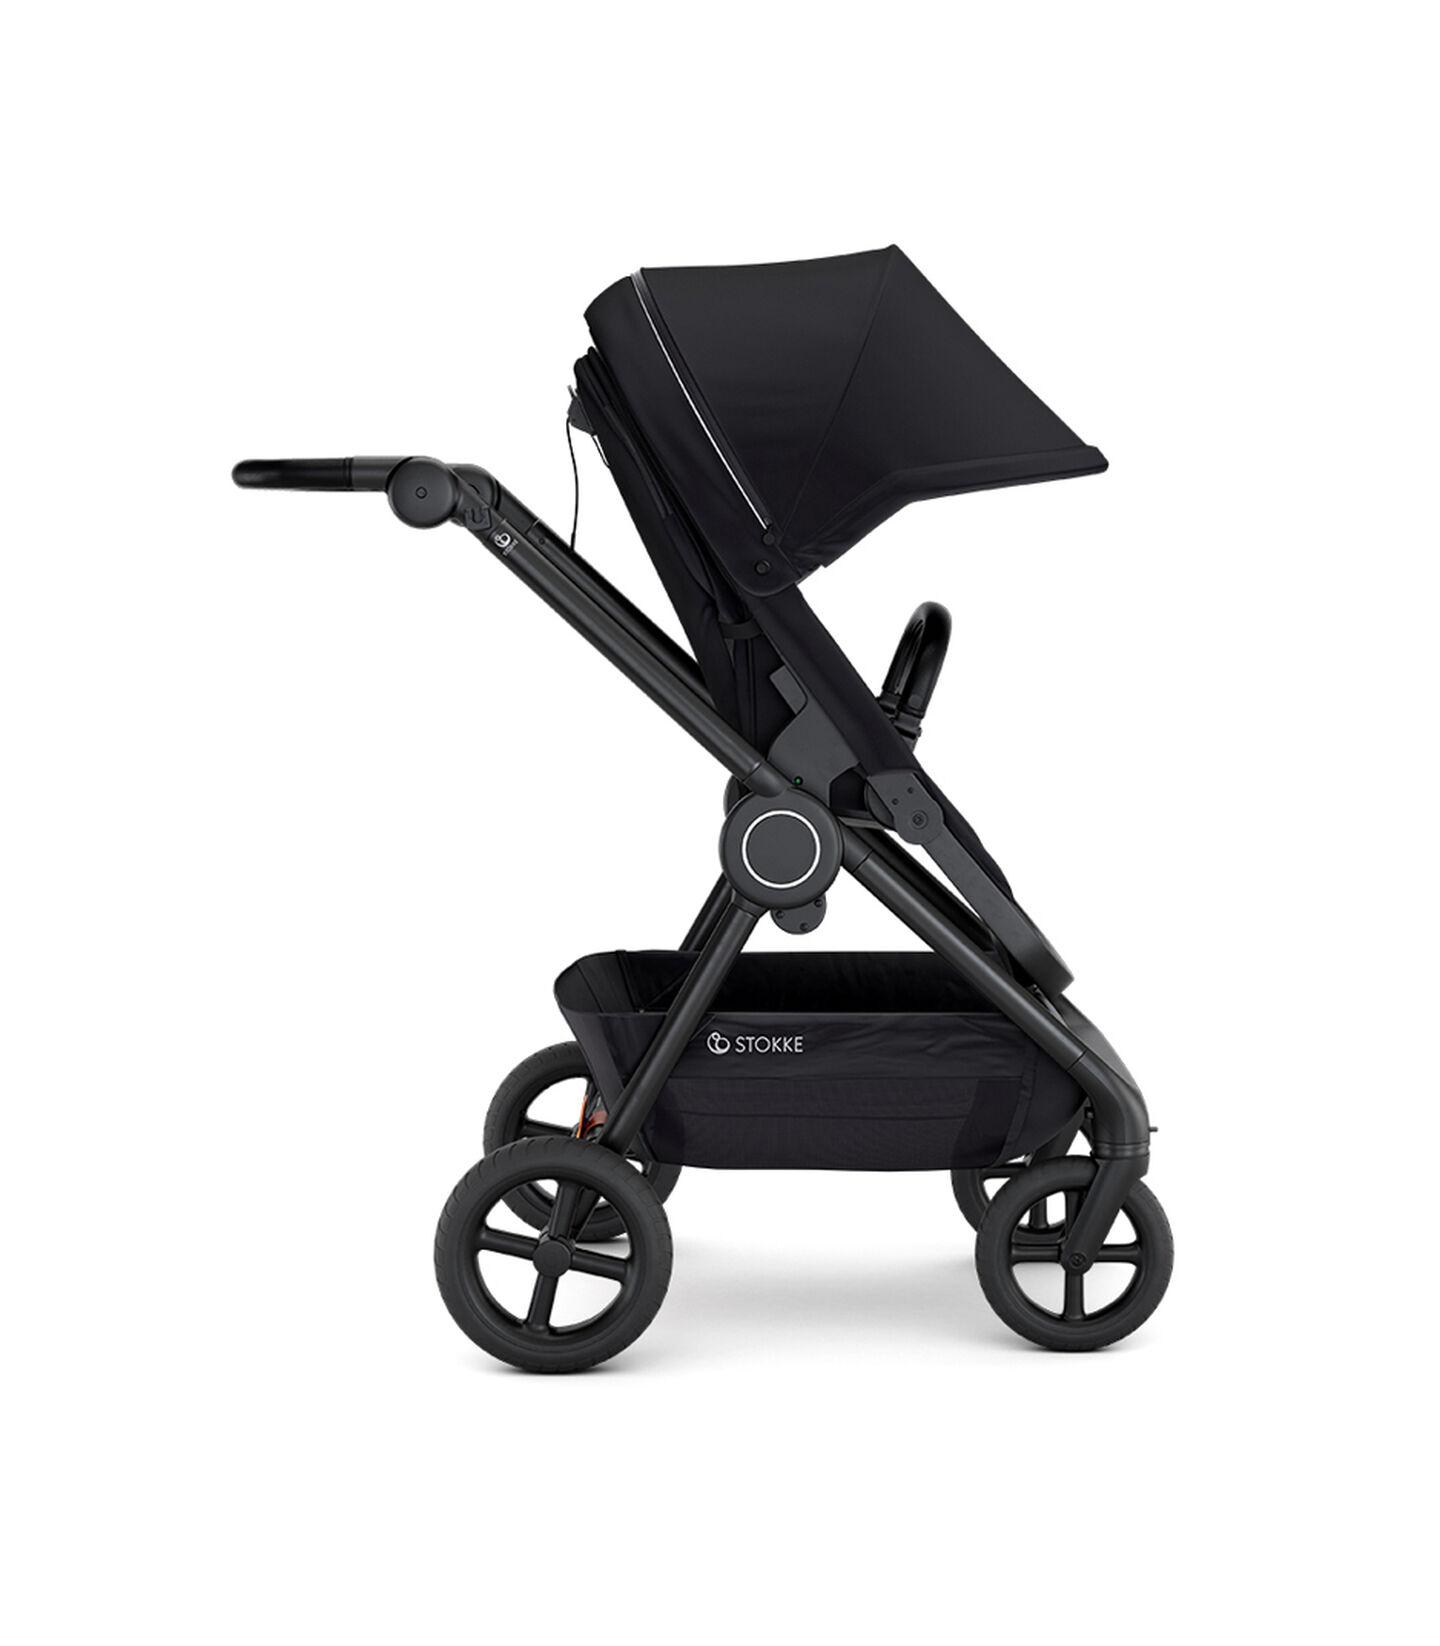 Stokke® Beat™ with Seat. Black. Forward facing.